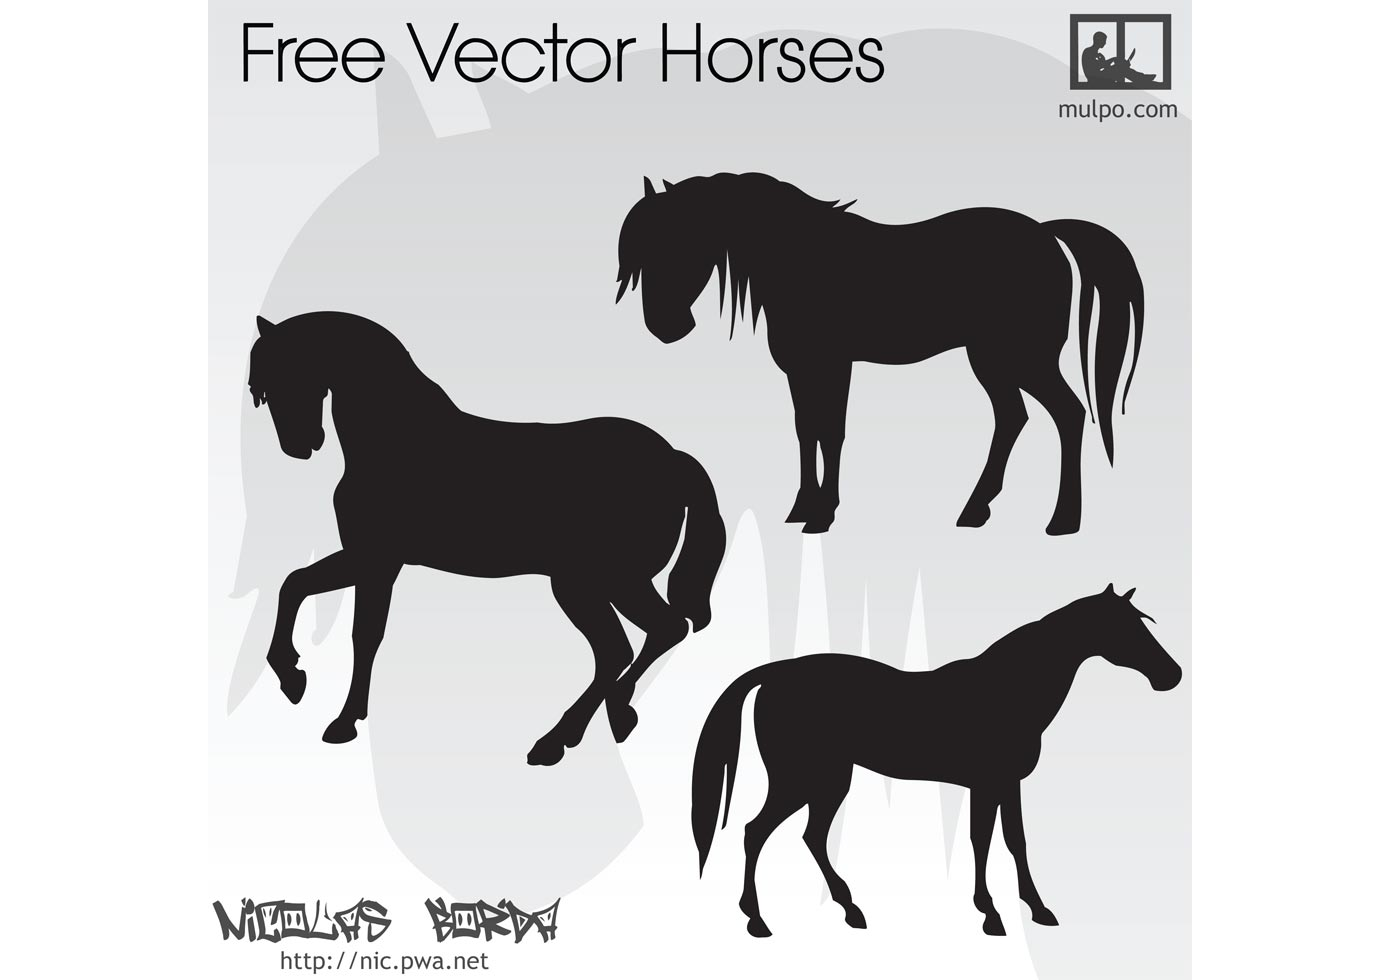 Free-vector-horses